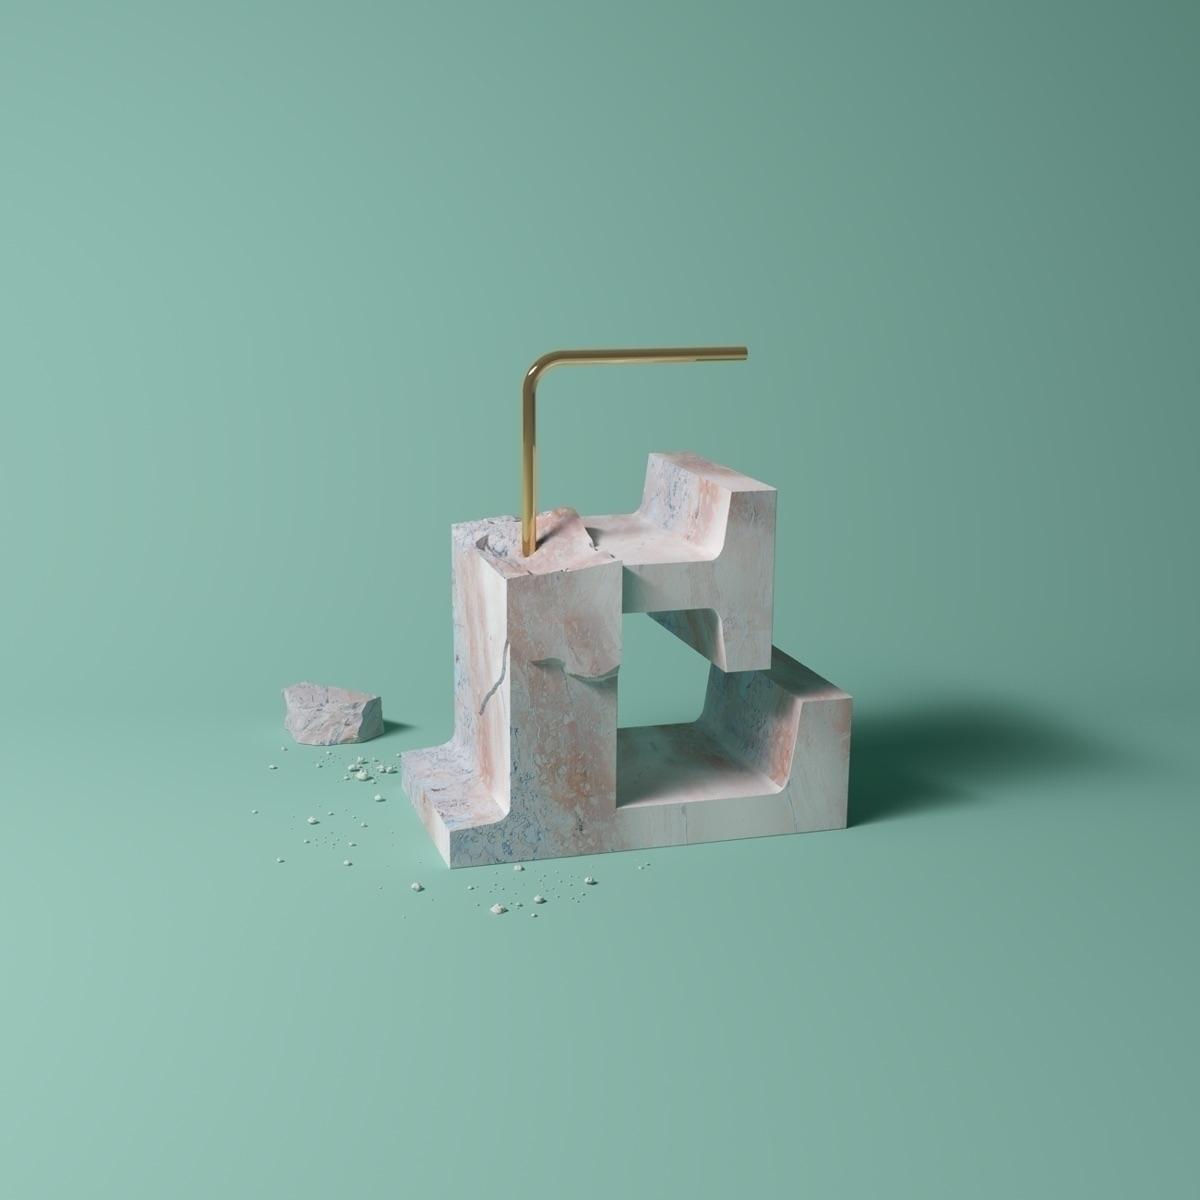 Letter - marble, type, art, cgi - molistudio | ello